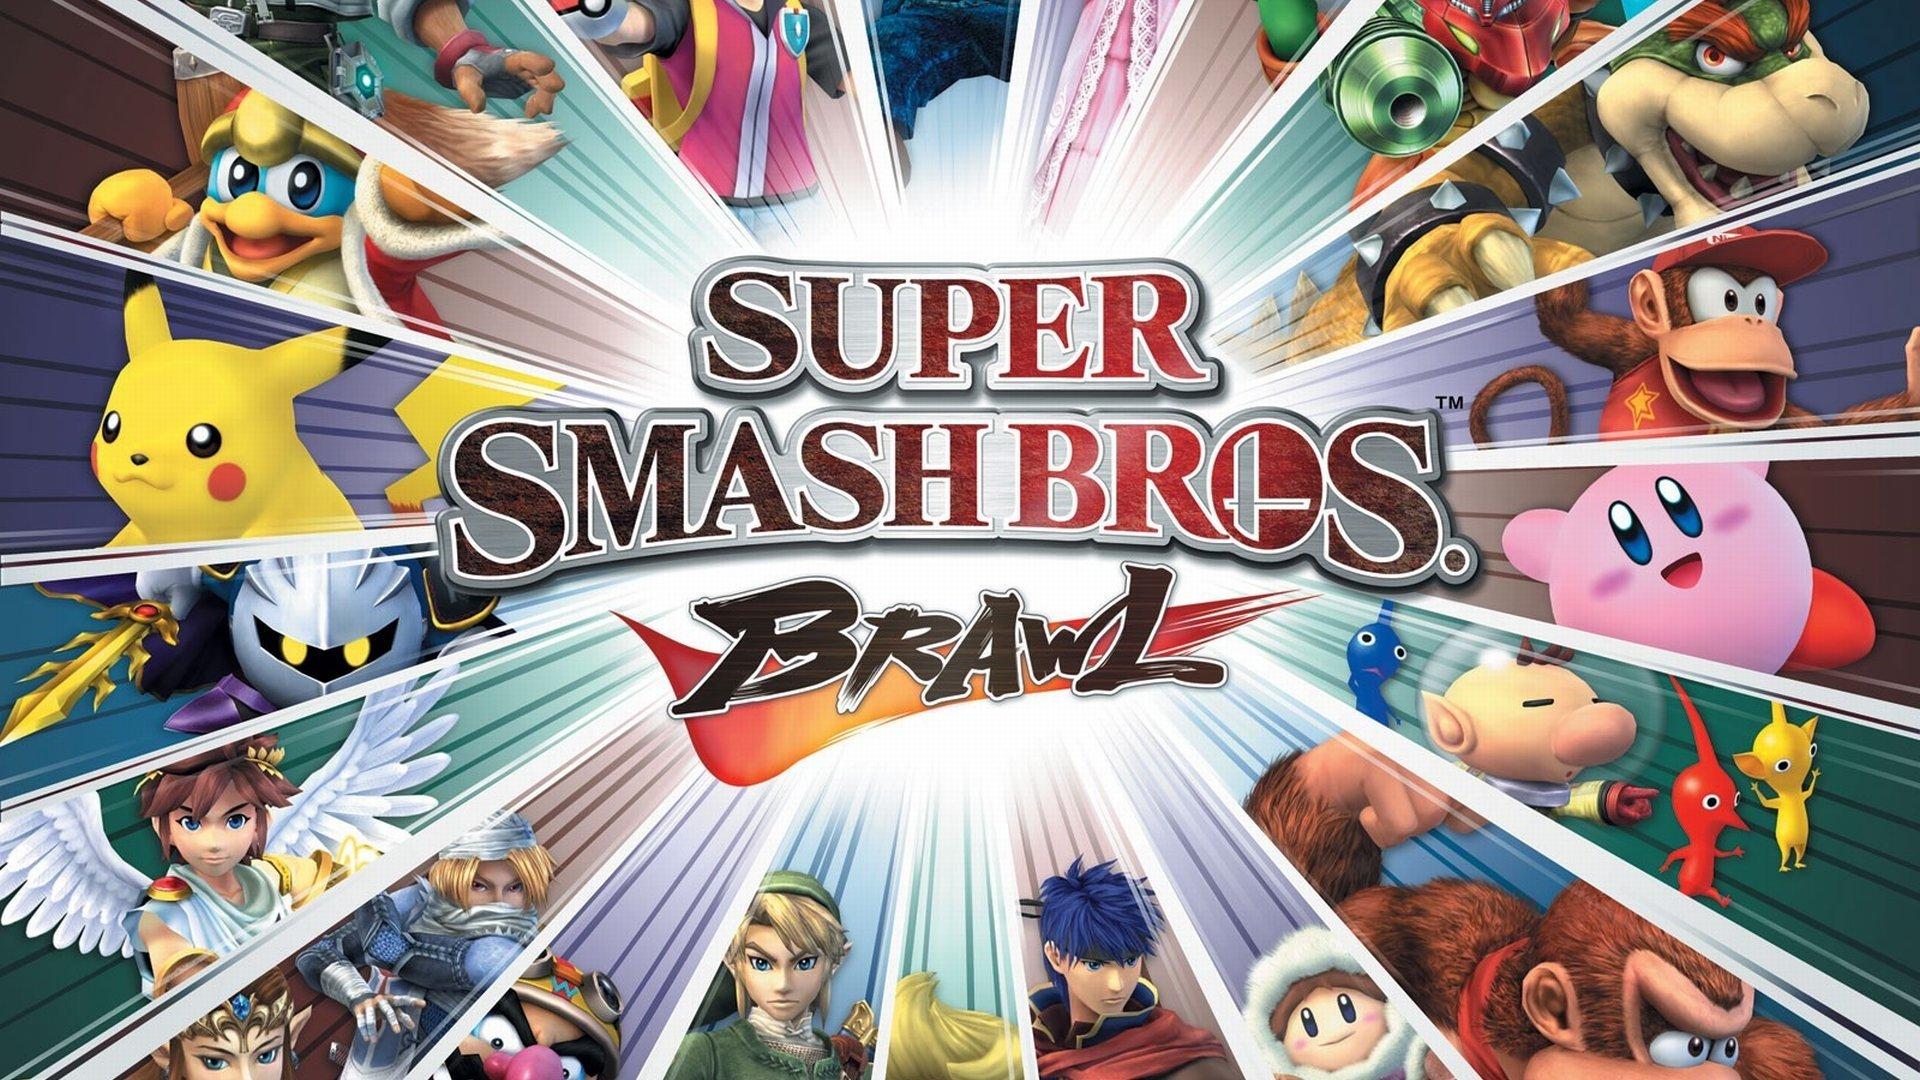 Super Smash Bros Brawl Hd Wallpaper Background Image